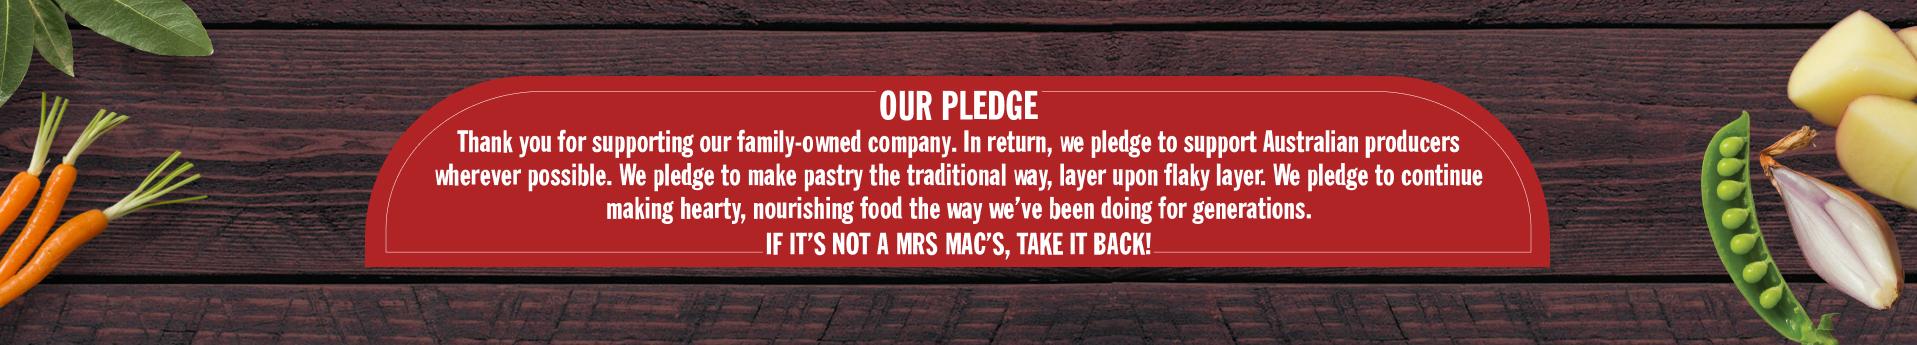 pledge-desktop-banner